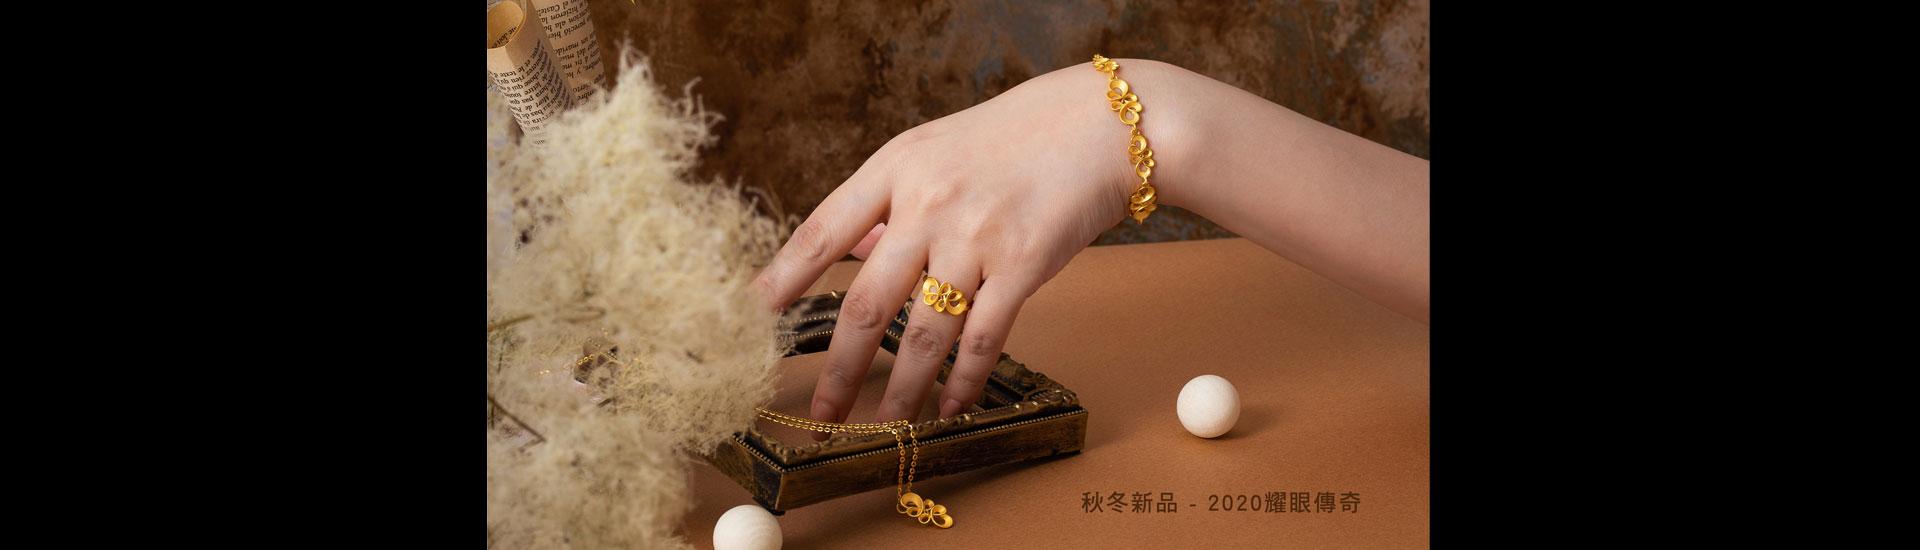 Just Gold鎮金店秋冬全新首飾系列耀眼傳奇